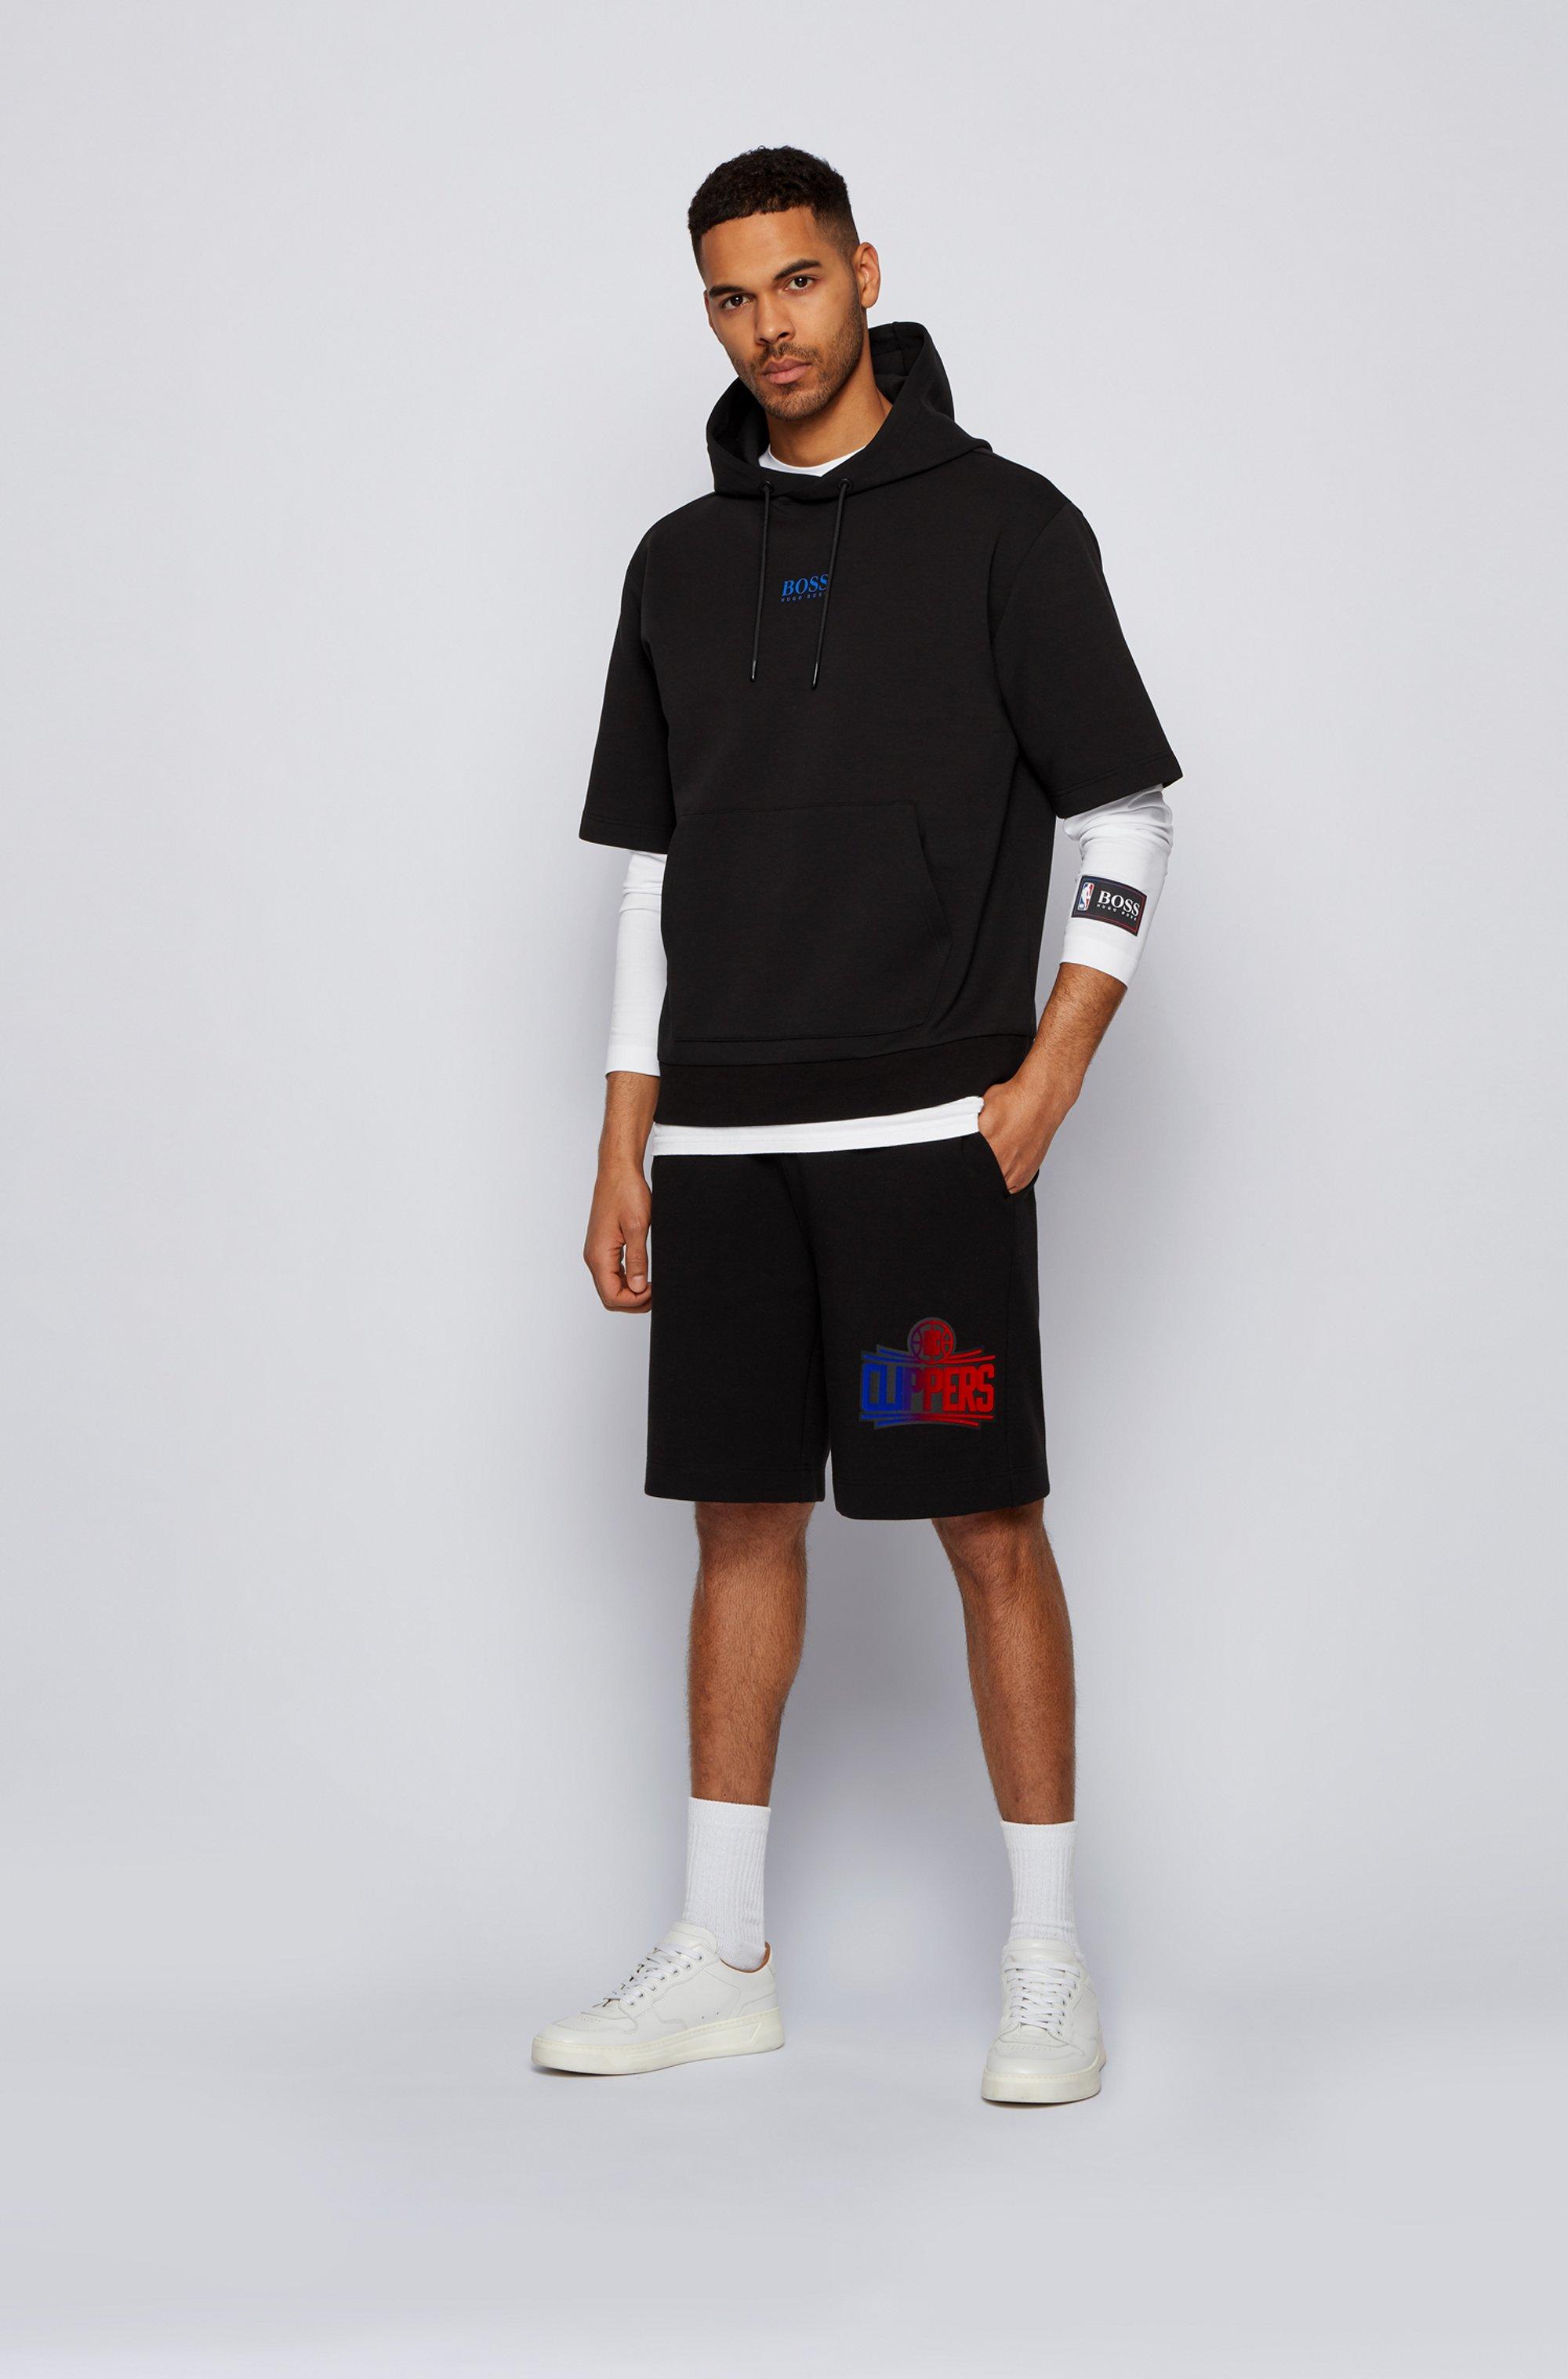 Long-sleeved T-shirt from BOSS x NBA with team logo